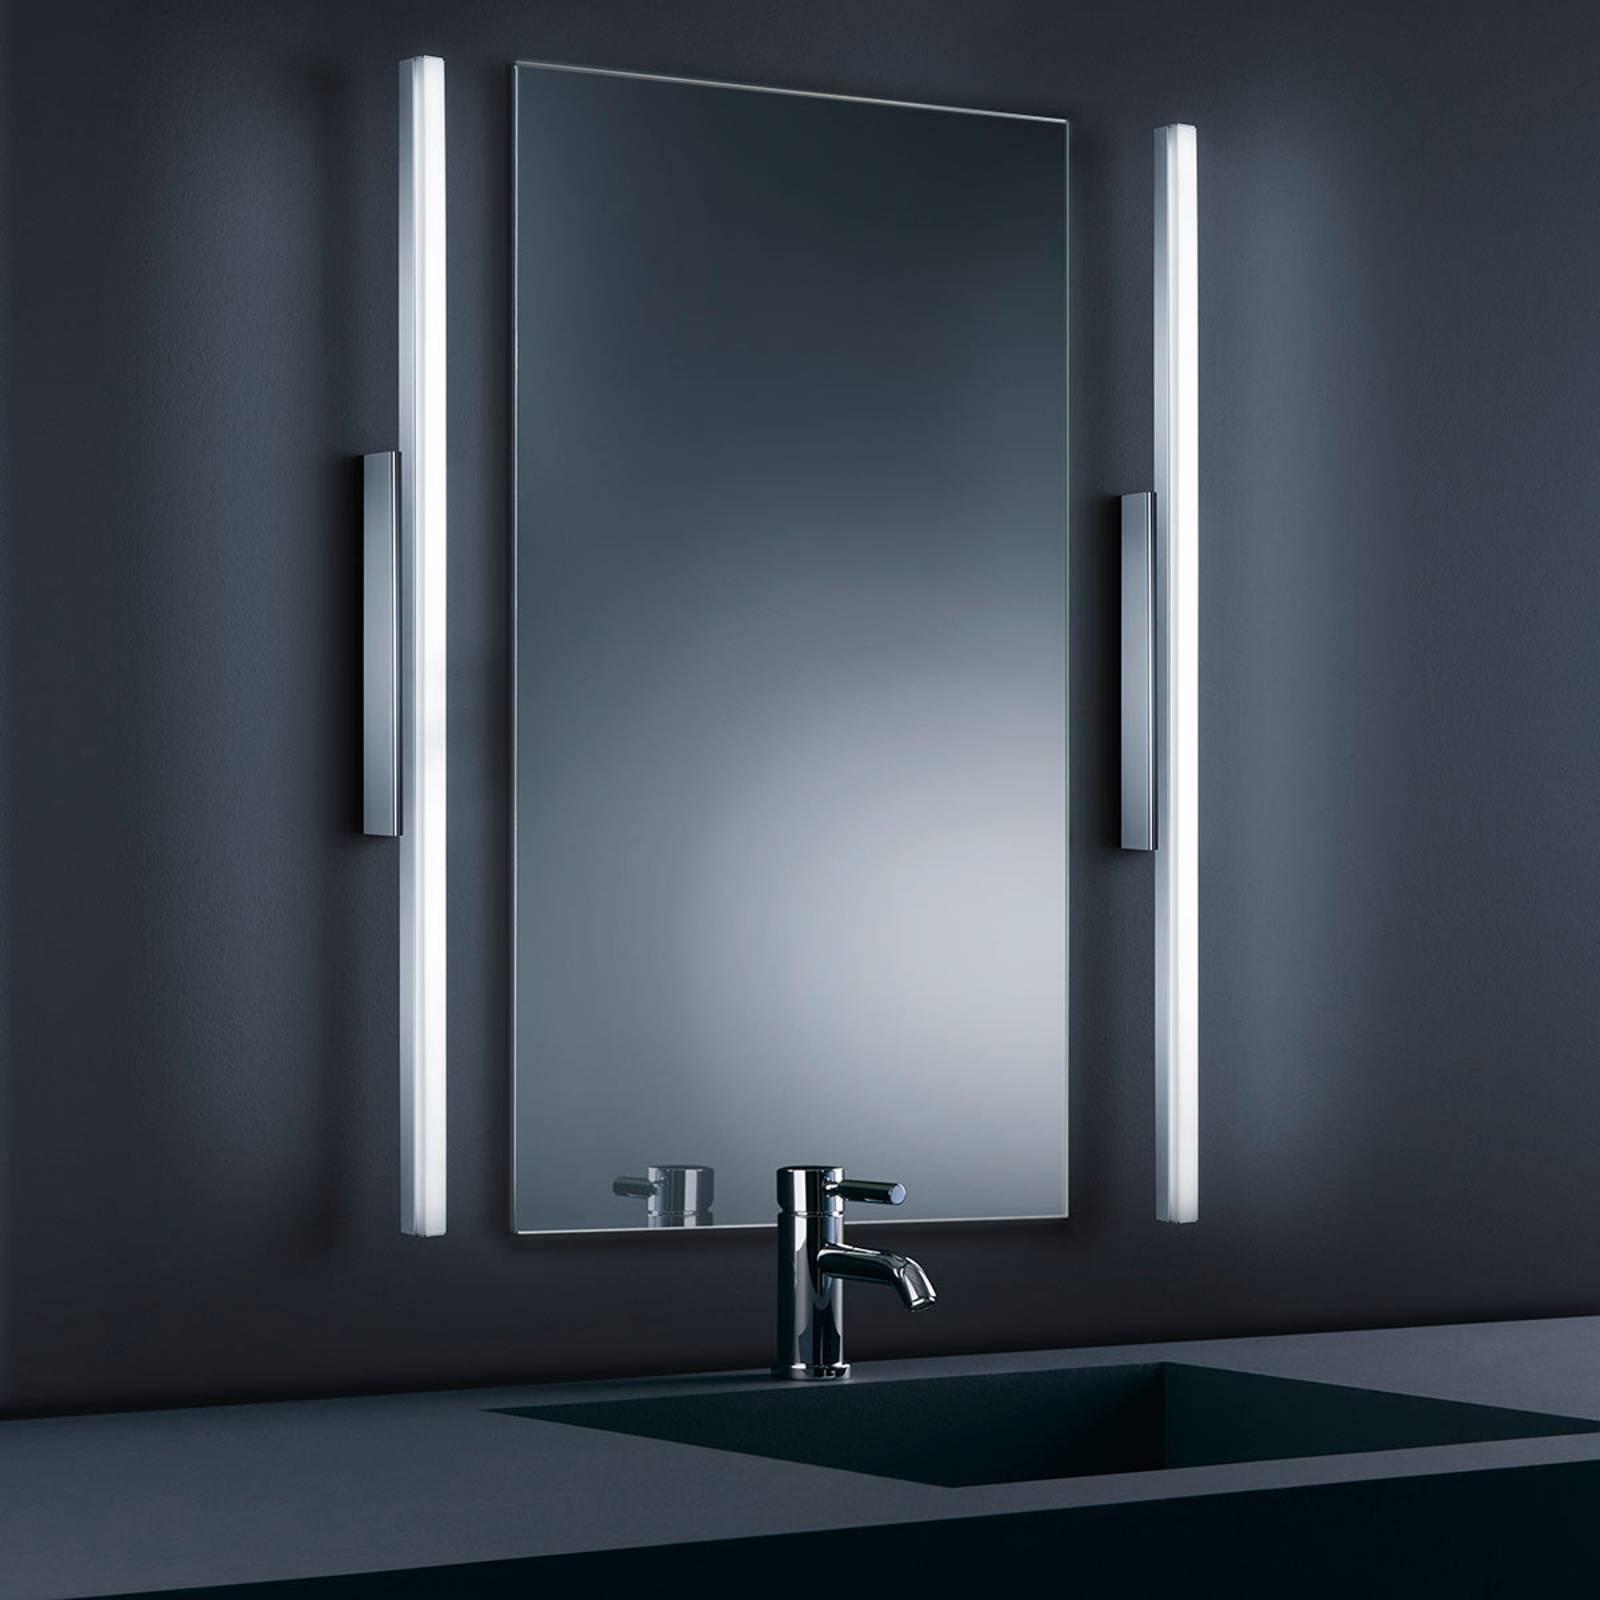 Baulmann 65.104.81 LED-Wandleuchte 90 cm edelstahl